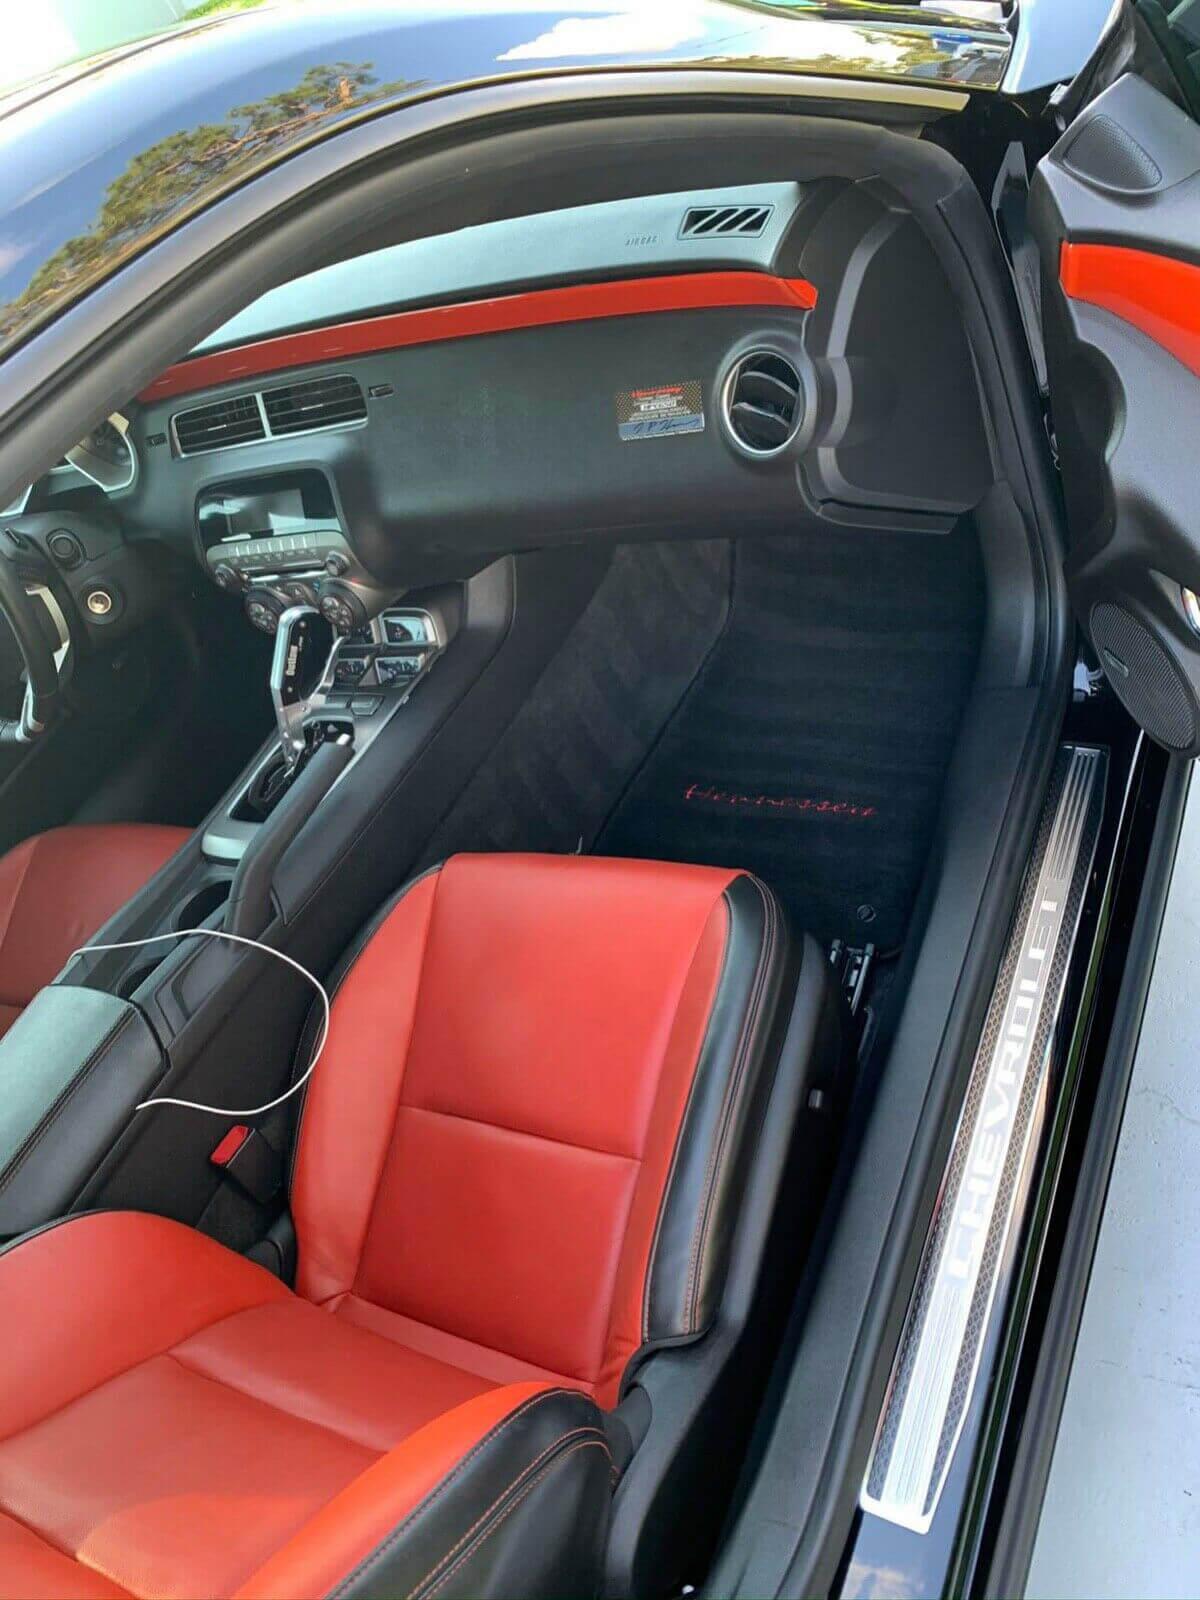 Chevy Camaro SS orange interior